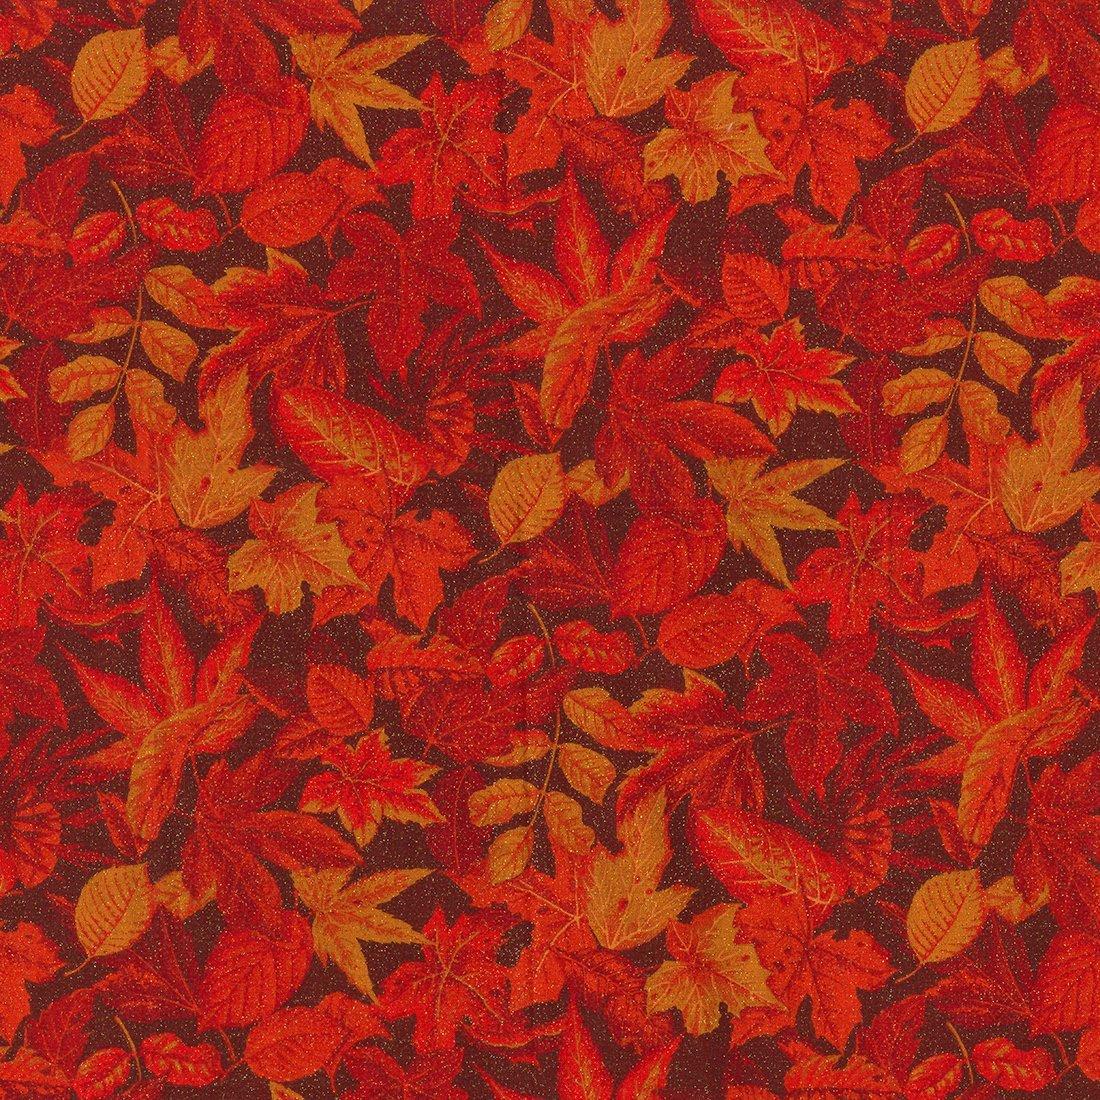 Glitter Autumn Leaves 15178